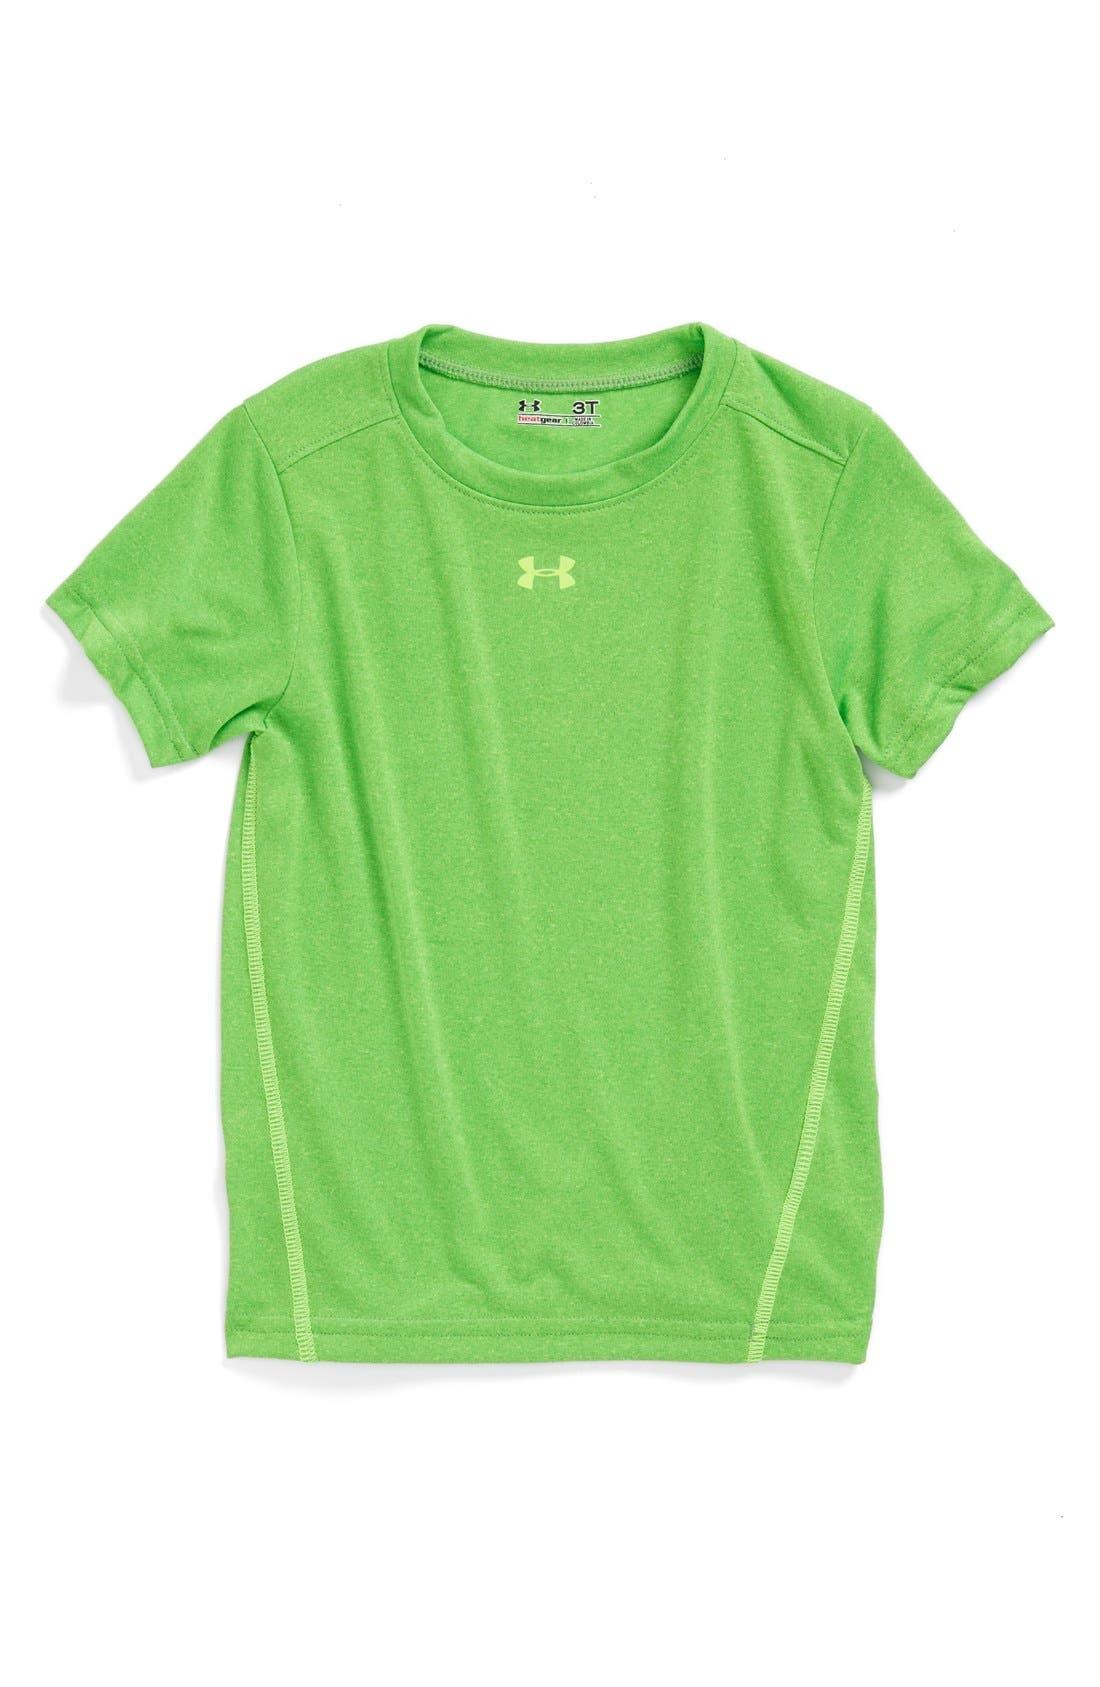 Alternate Image 1 Selected - Under Armour 'Commingled' HeatGear® T-Shirt (Toddler Boys)